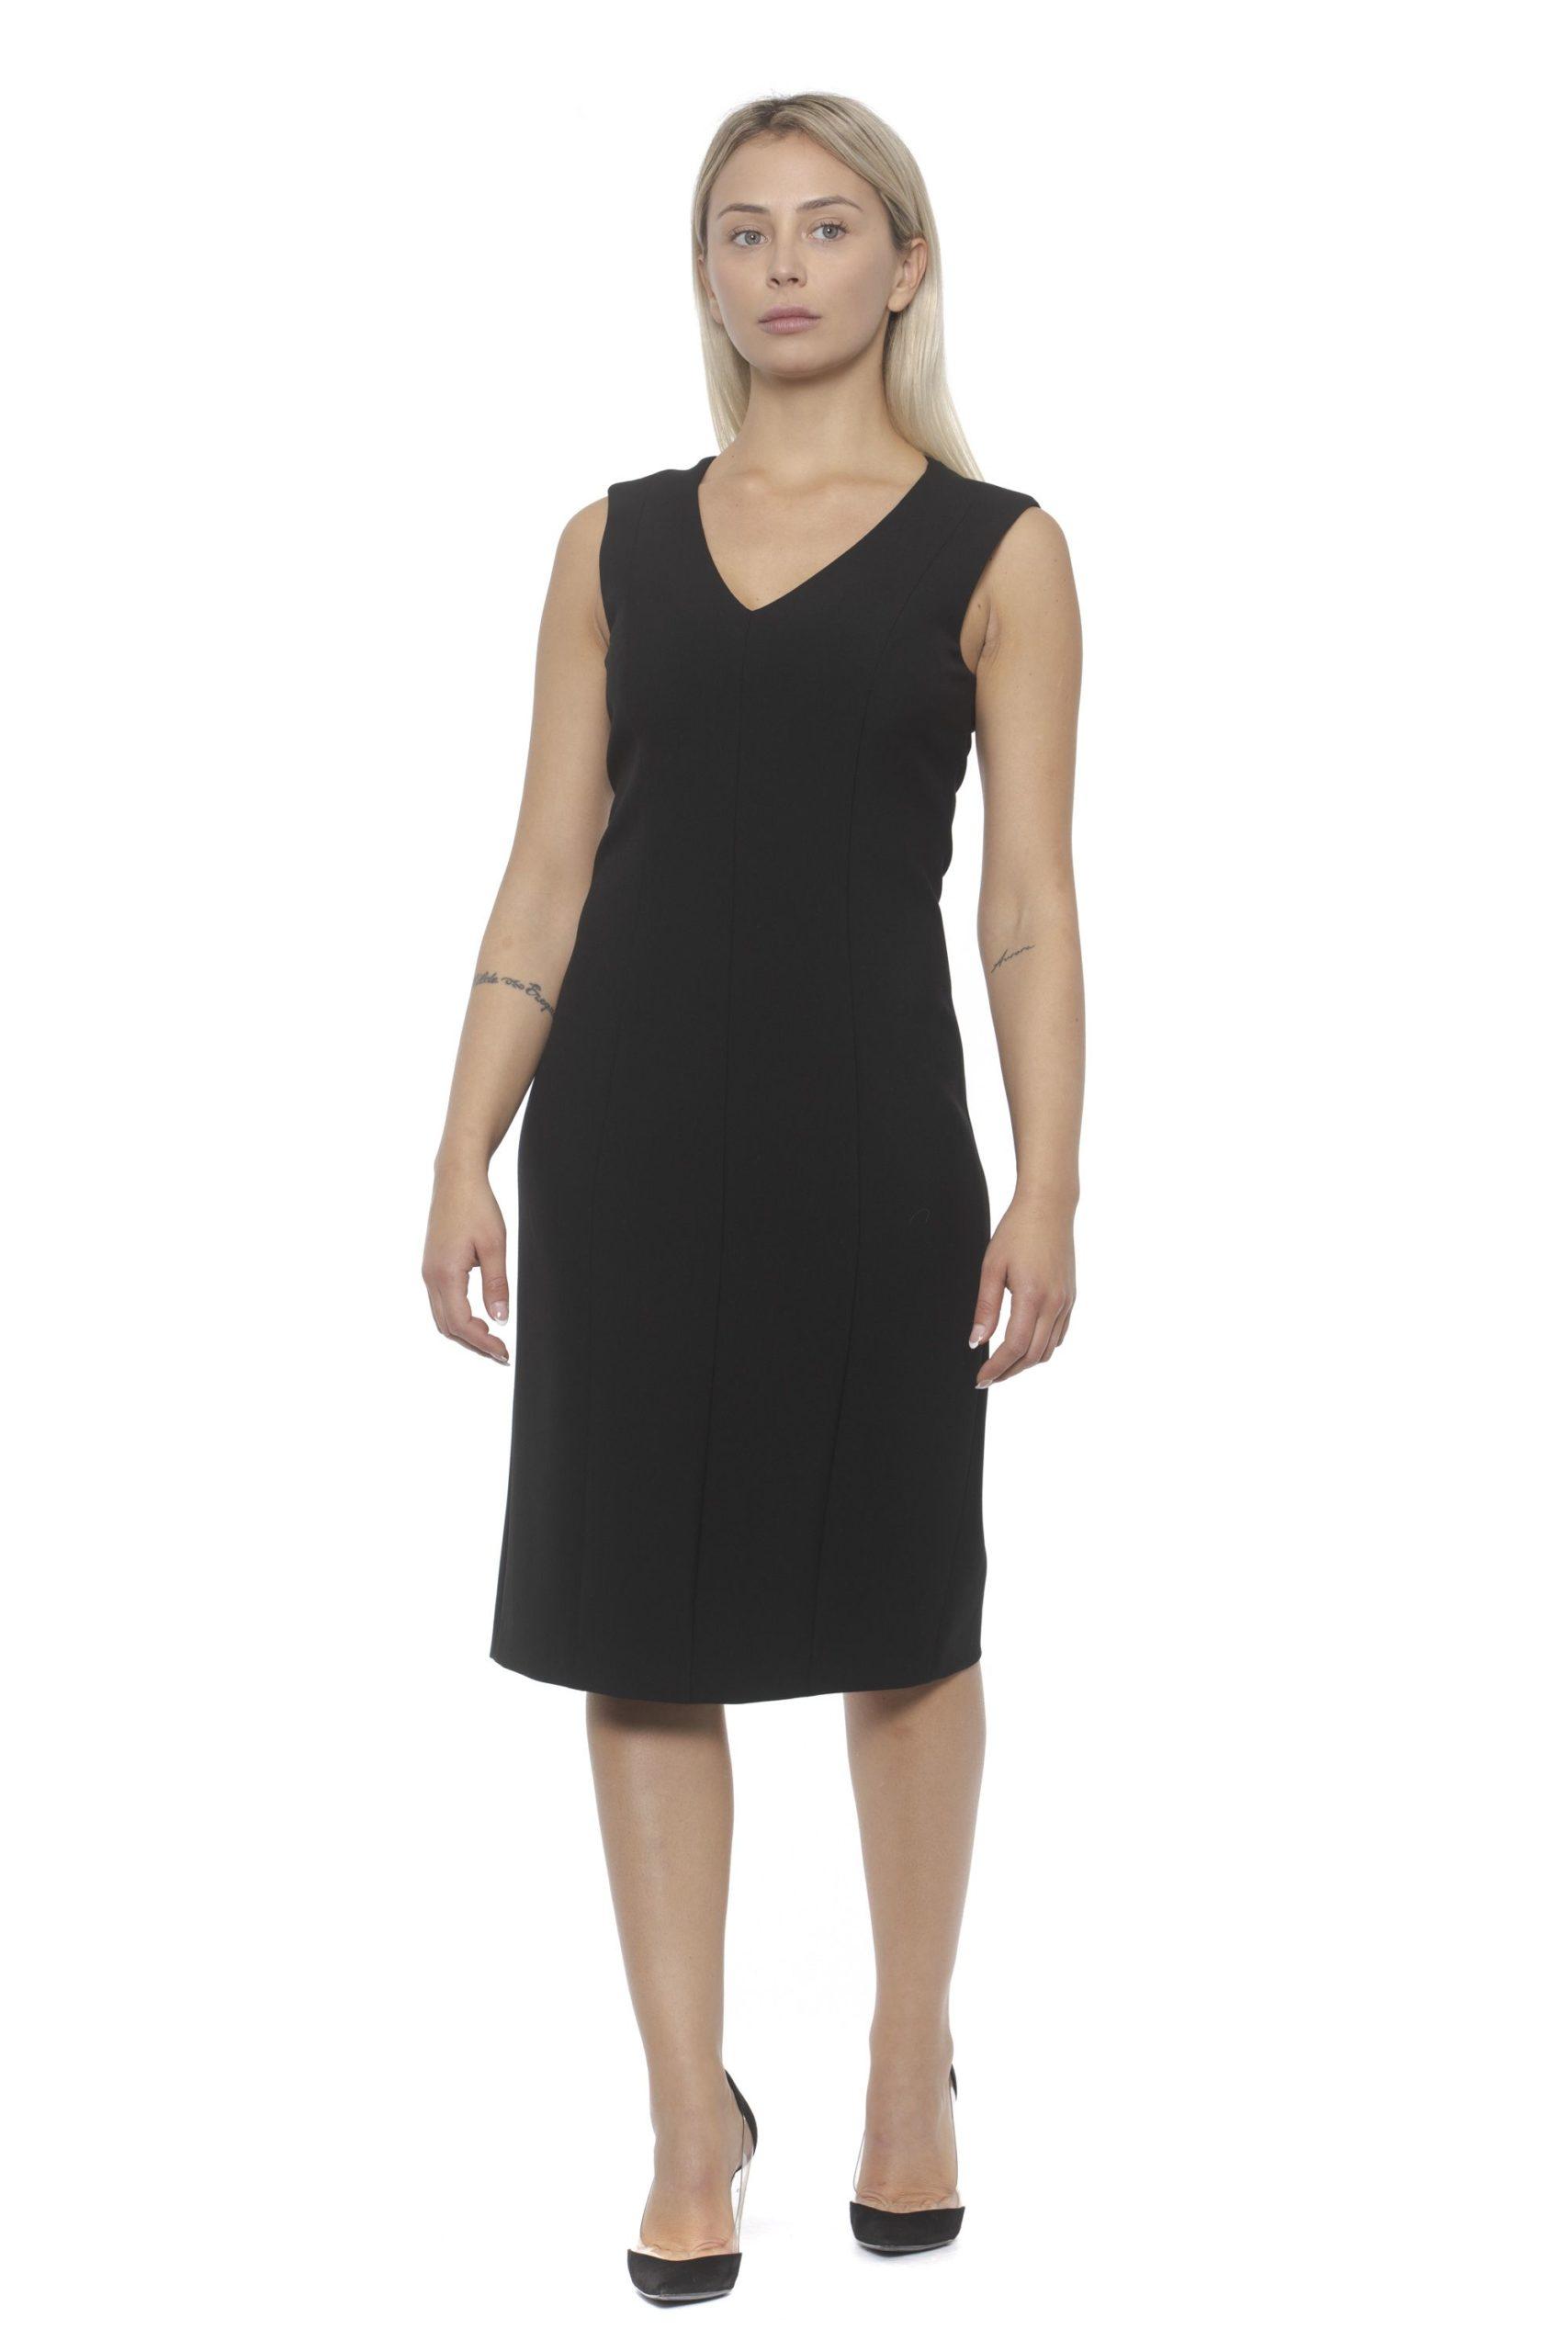 Peserico Women's Nero Dress Black PE1383164 - IT42 | S